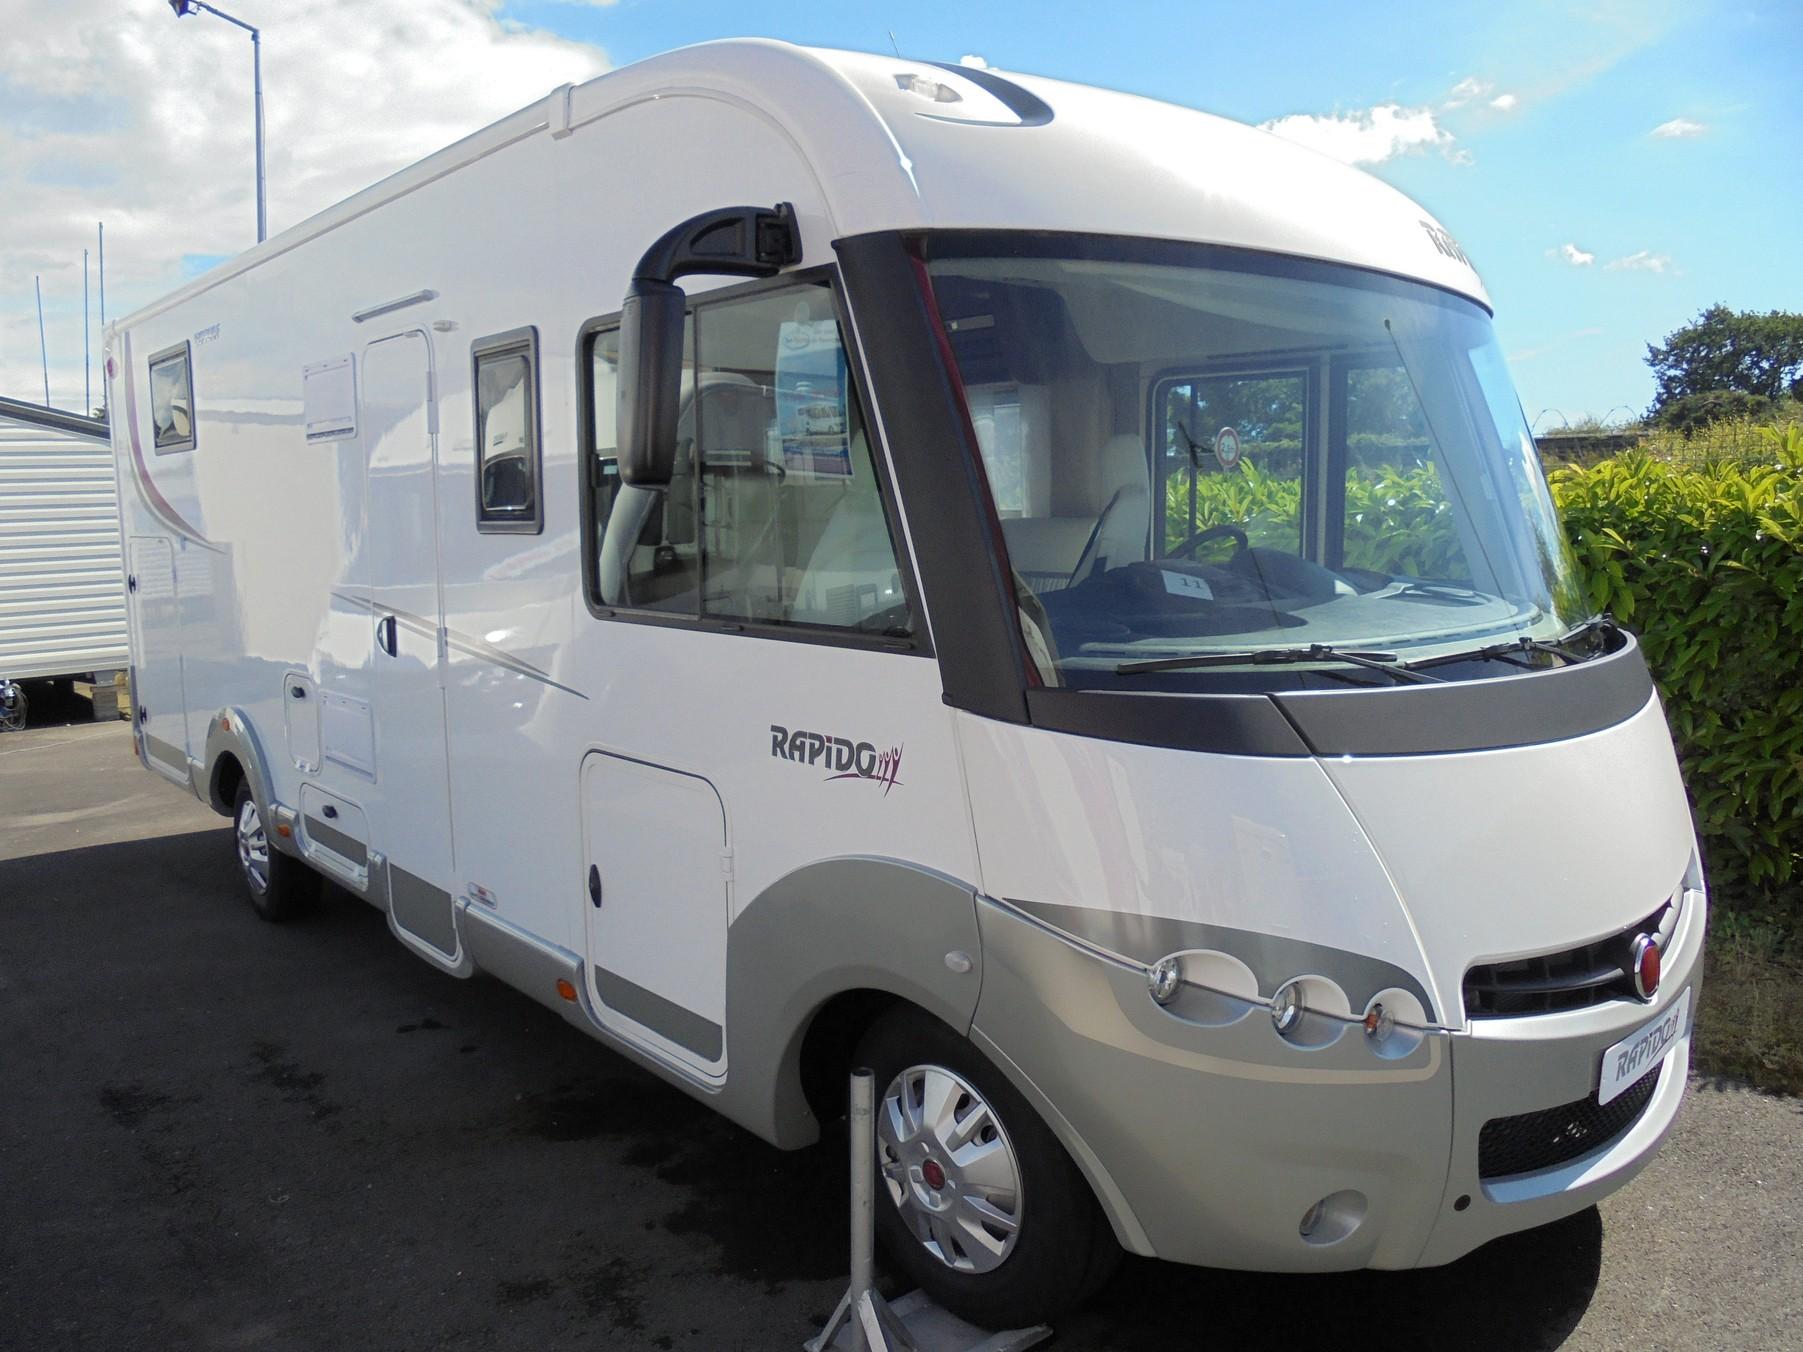 rapido 8090 df neuf fiat camping car en vente treillieres loire atlantique 44. Black Bedroom Furniture Sets. Home Design Ideas